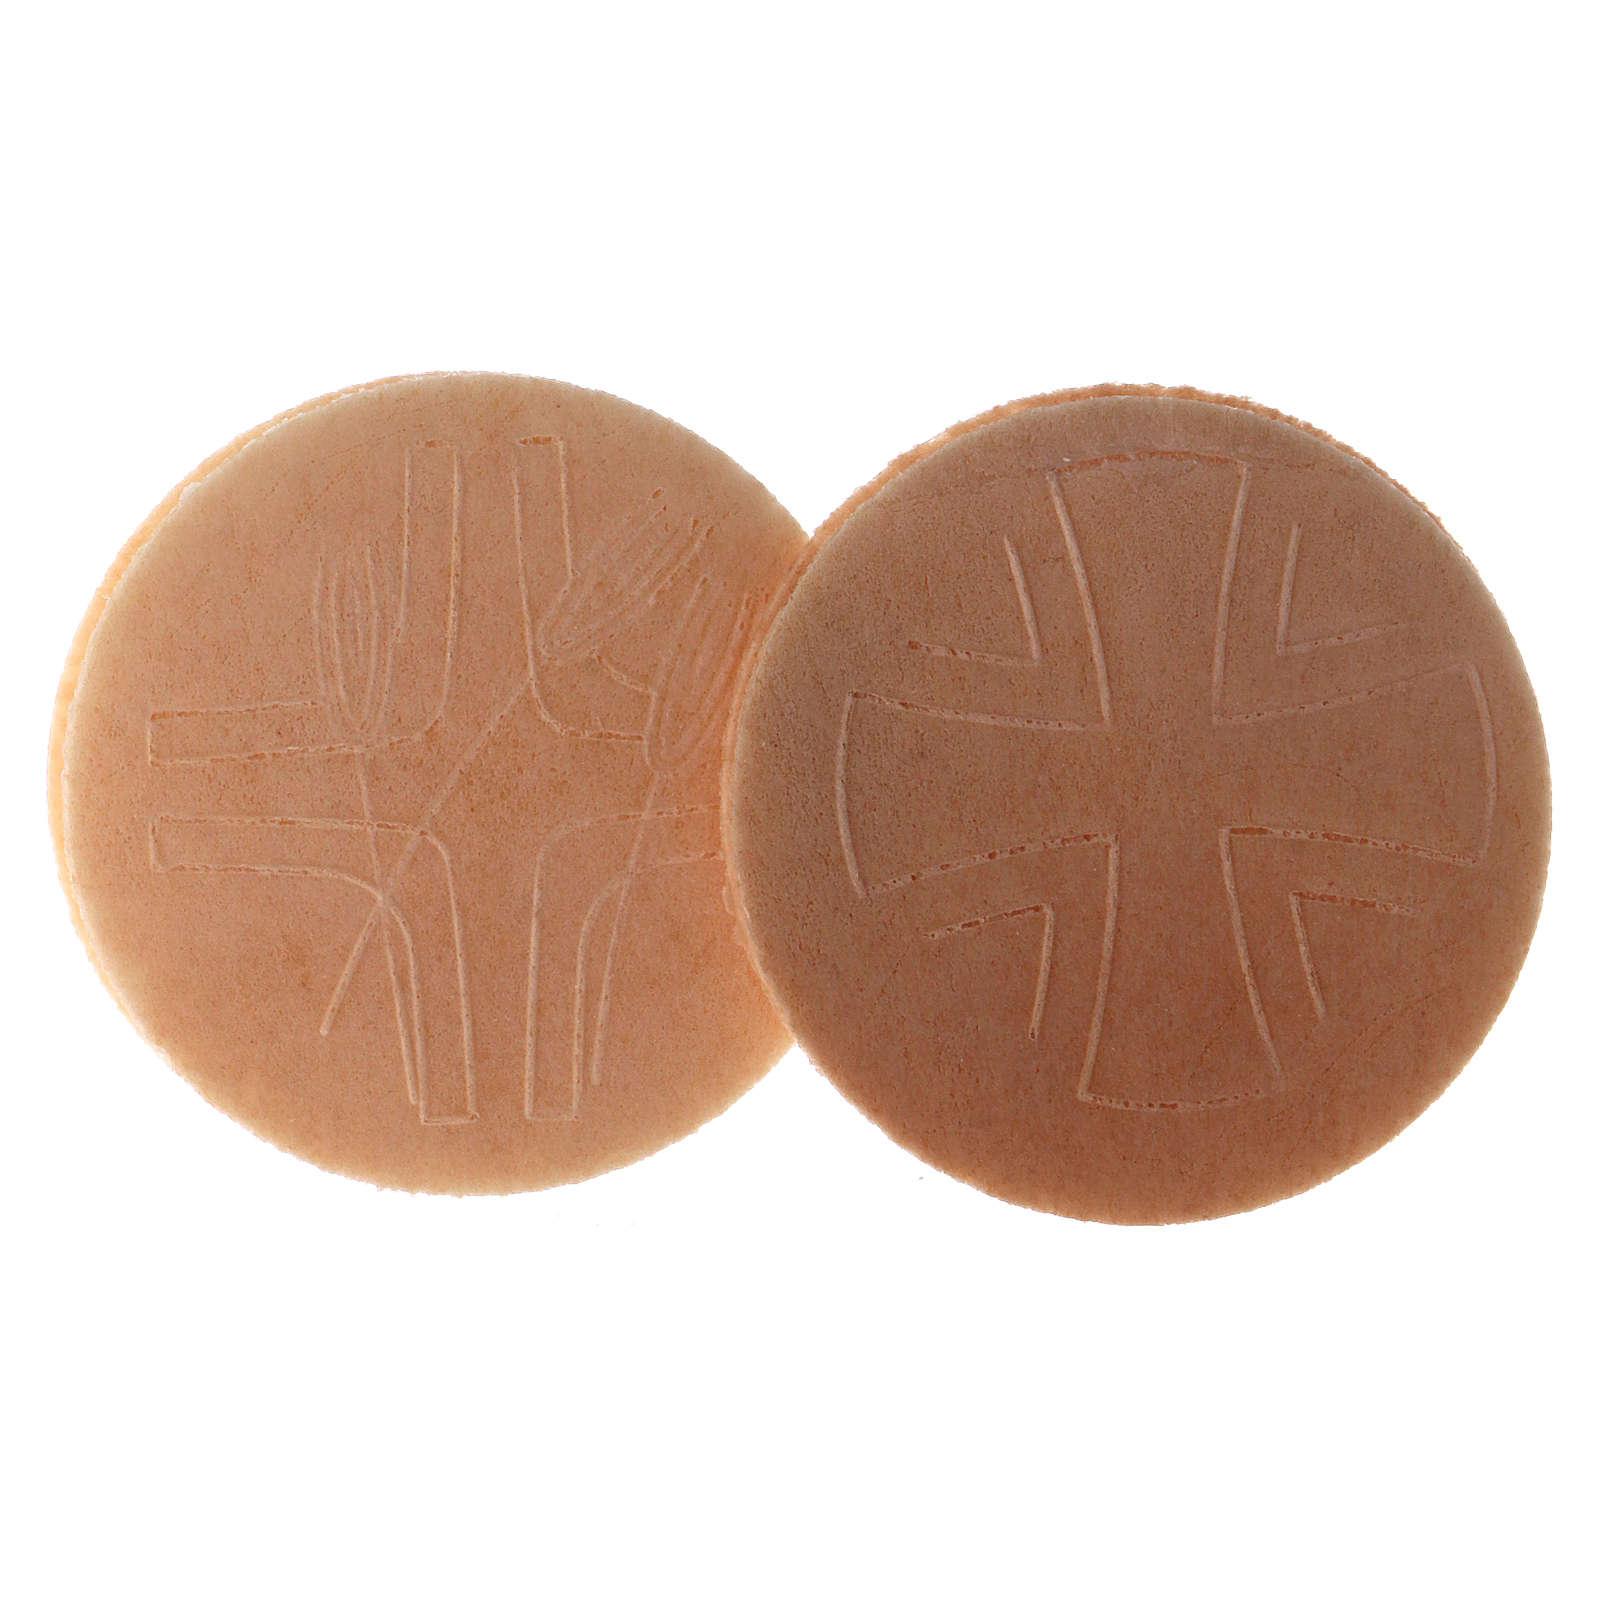 Hostia Magna de pan, 15 piezas, díametro 7,5 cm 3